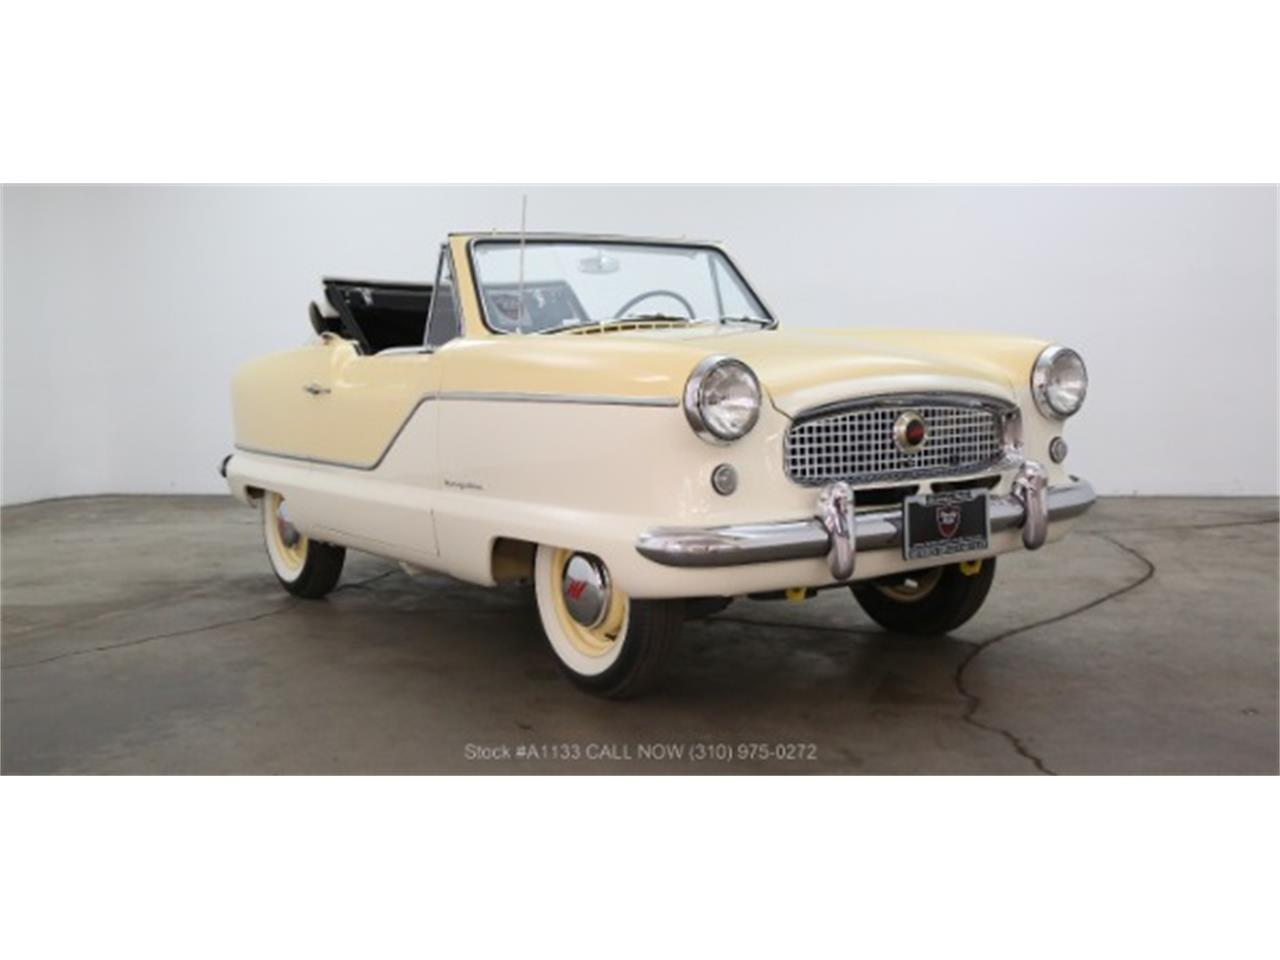 1962 nash metropolitan for sale classiccars cc 1101294 Value of Nash Metropolitan large picture of 62 metropolitan nlri